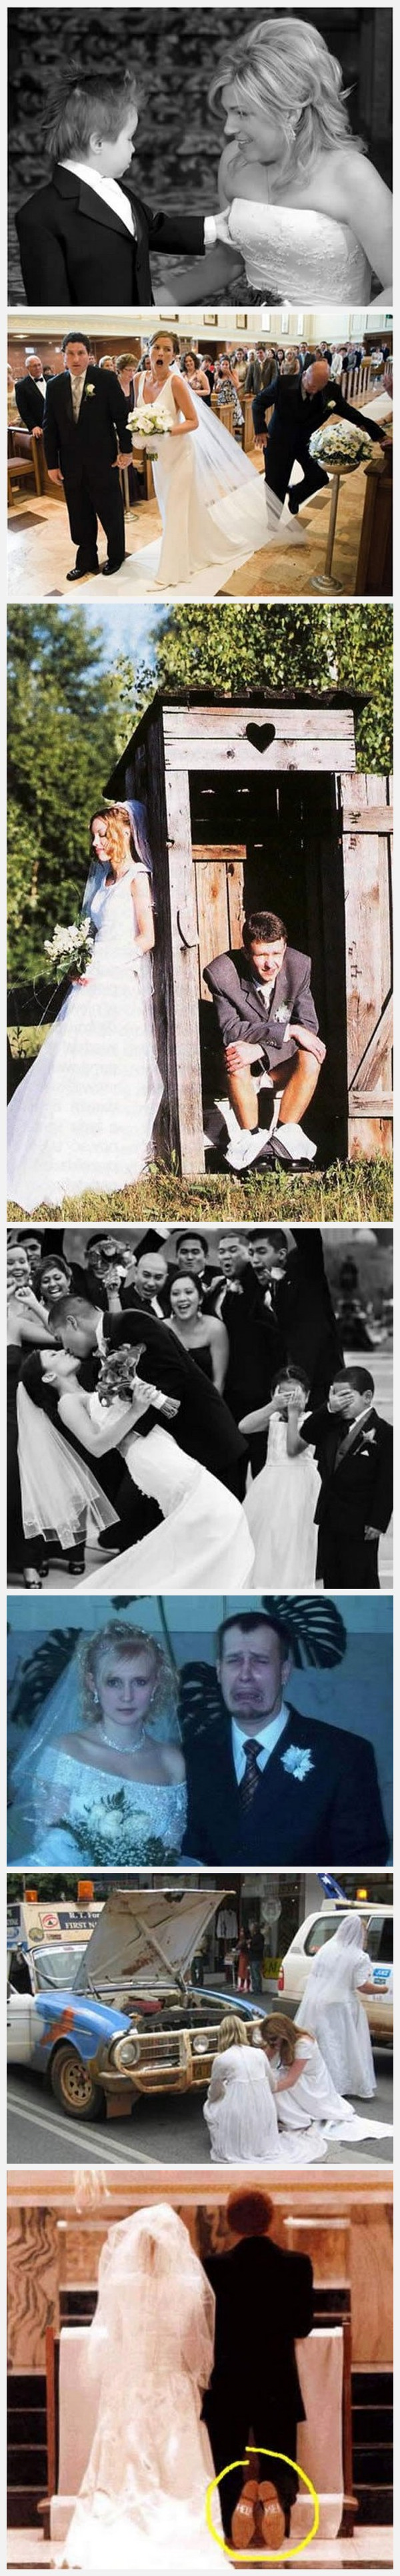 fotografias graciosas risa bodas recien casados humor